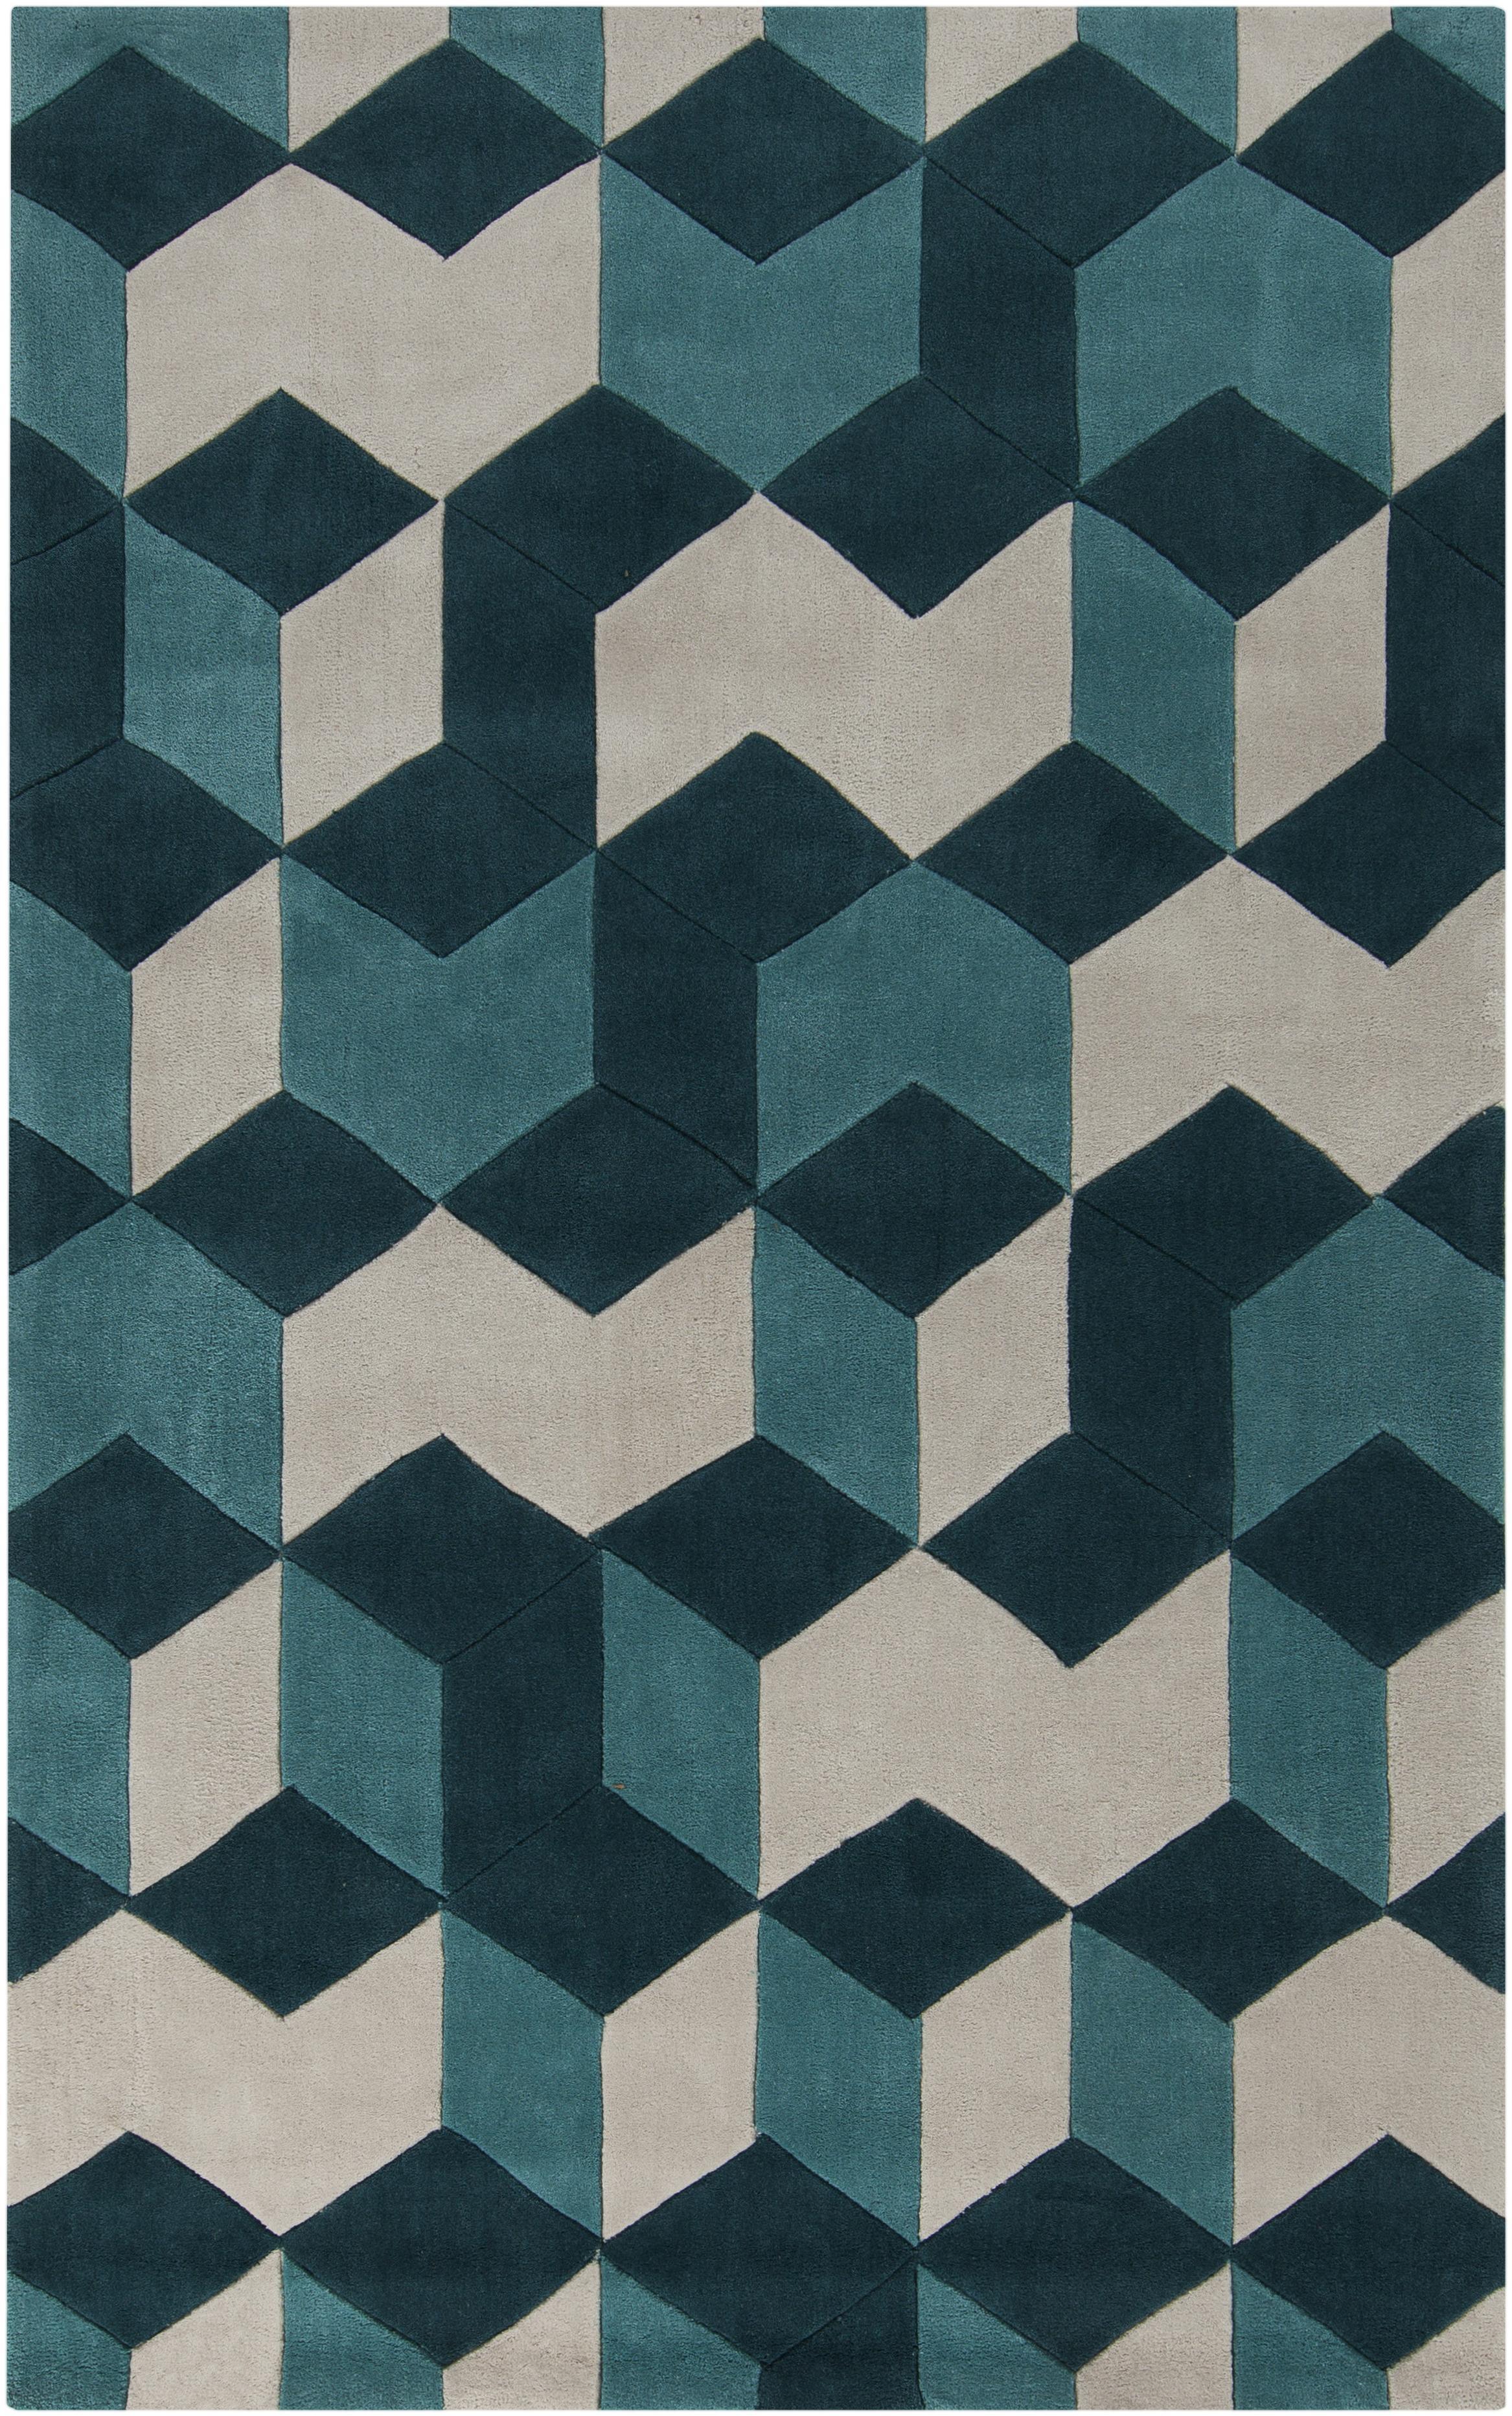 Cosmopolitan 5' x 8' by Surya at Belfort Furniture